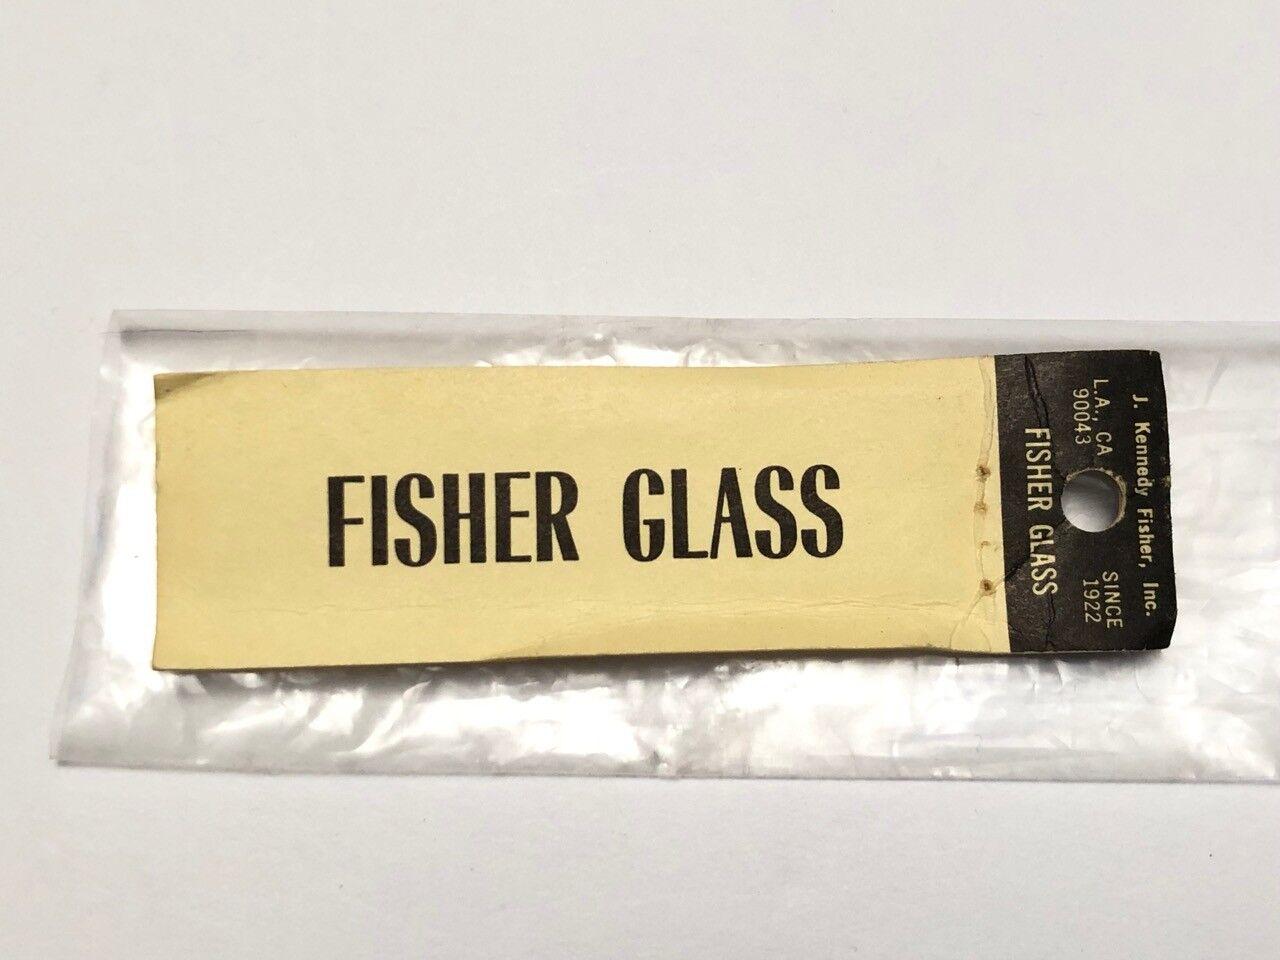 FISHER GLASS - Fiberglass Fly Rod Blank - 8' 5wt - Original